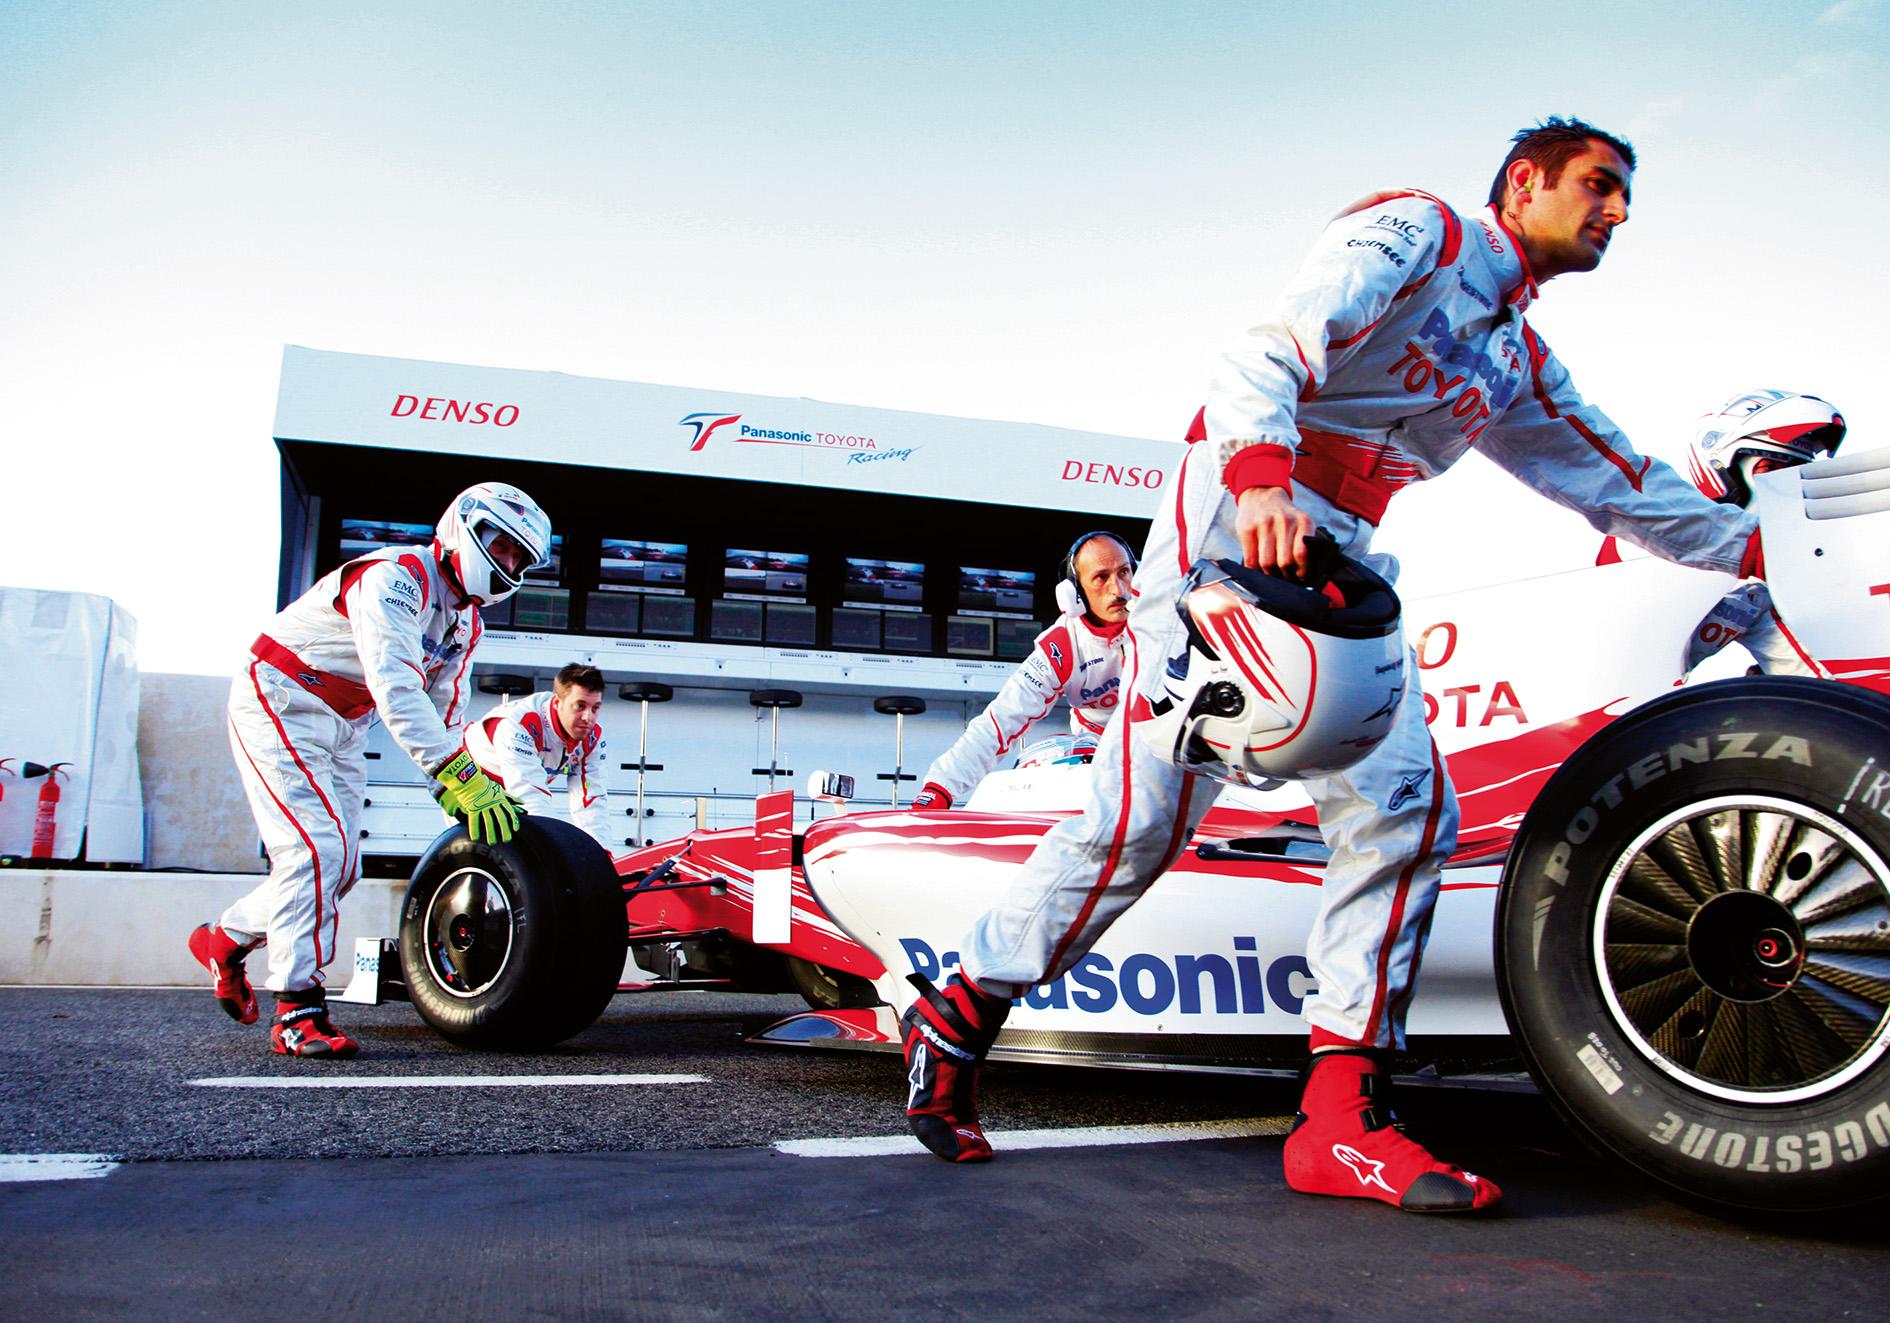 38_Josekdesign_Toyota_F1_Fotografie.jpg